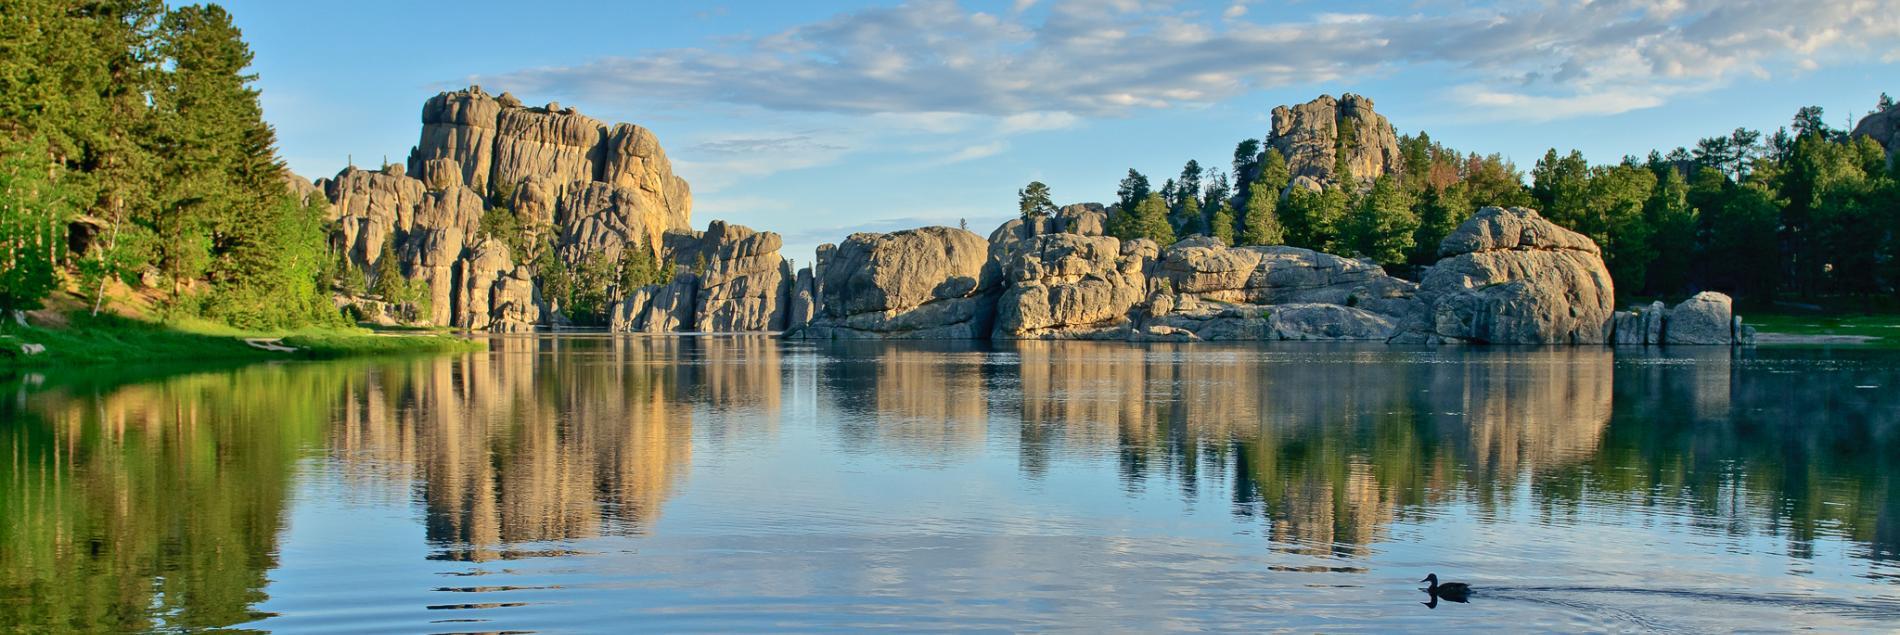 Wallpaper Sioux Falls Sylvan Lake Black Hills Amp Badlands South Dakota